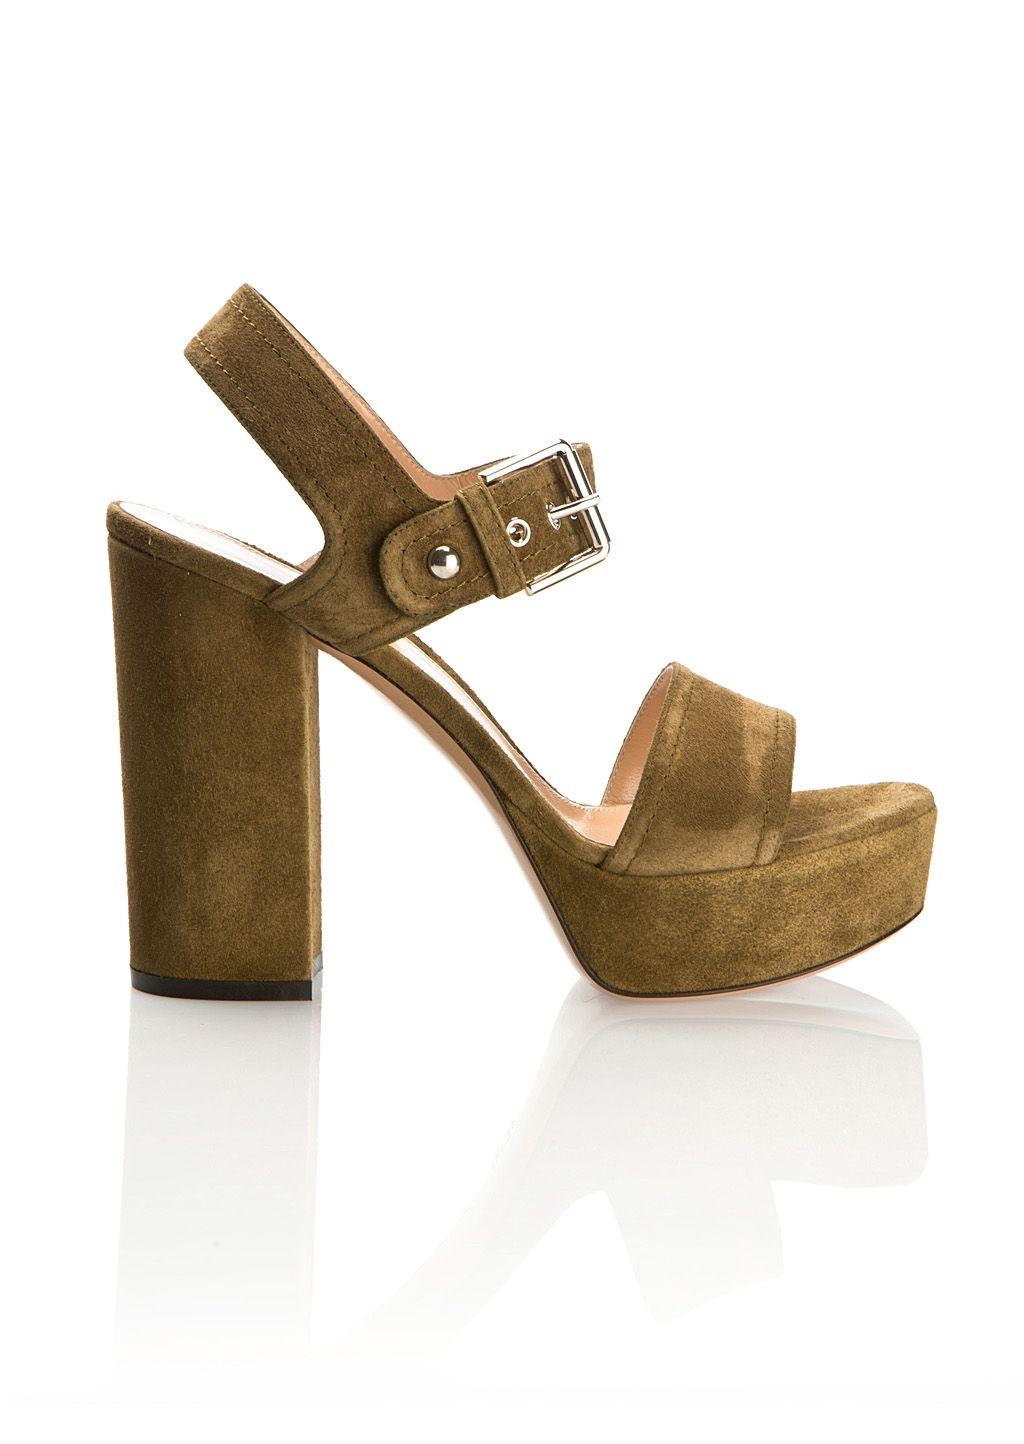 429eb1caf67a GIANVITO ROSSI Gianvito Rossi Marais Color Velvet Gina Platform Sandals.   gianvitorossi  shoes